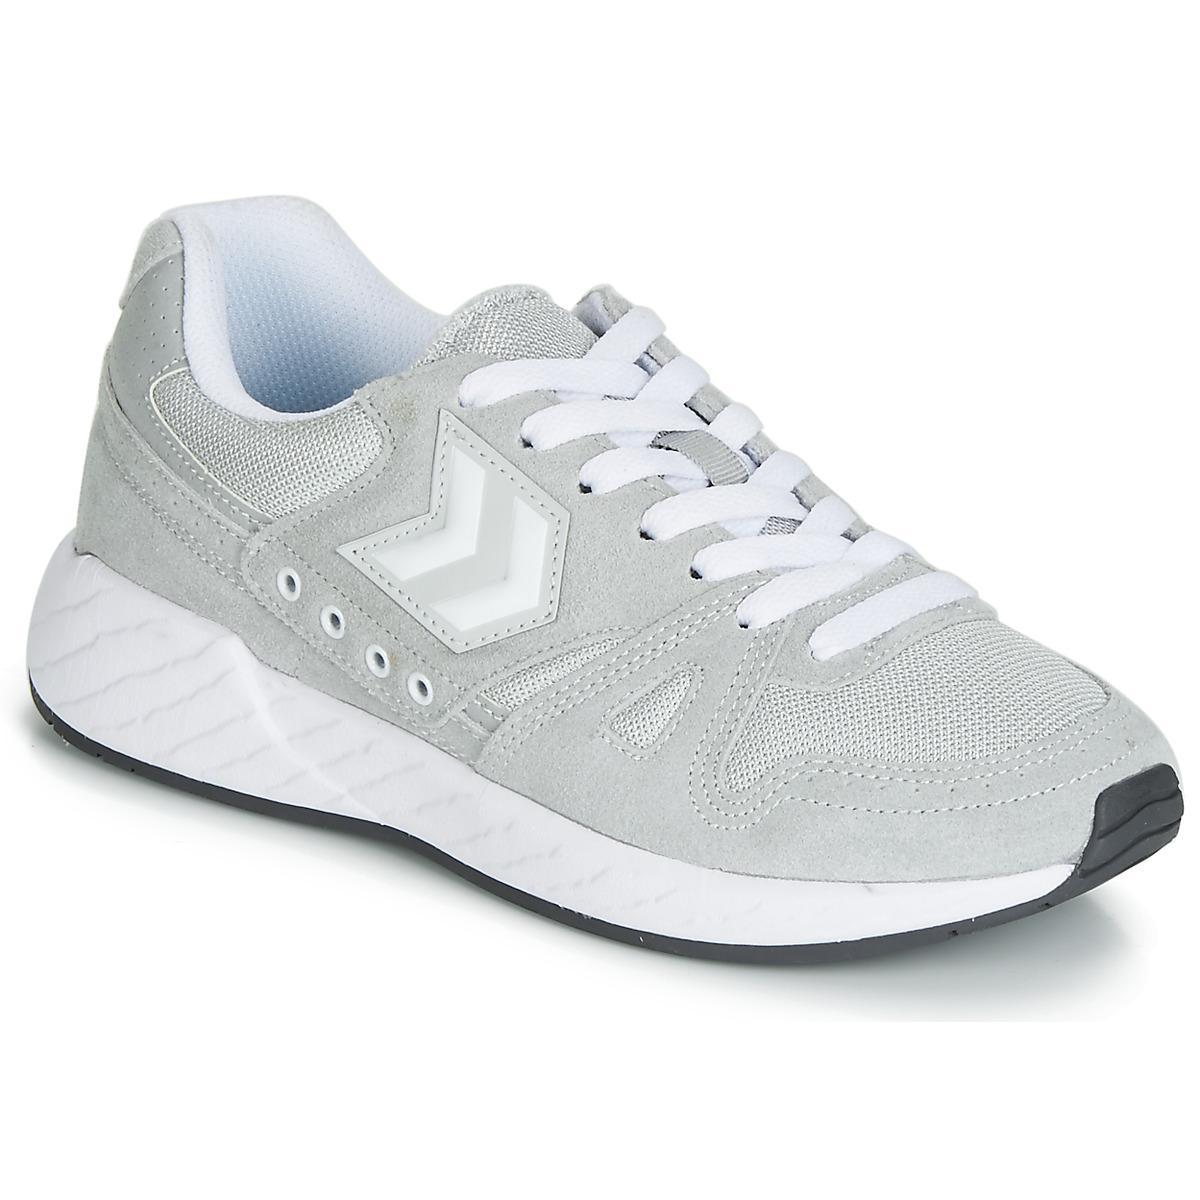 278fabaf9193 Hummel Legend Marathona Men s Shoes (trainers) In Grey in Gray for ...